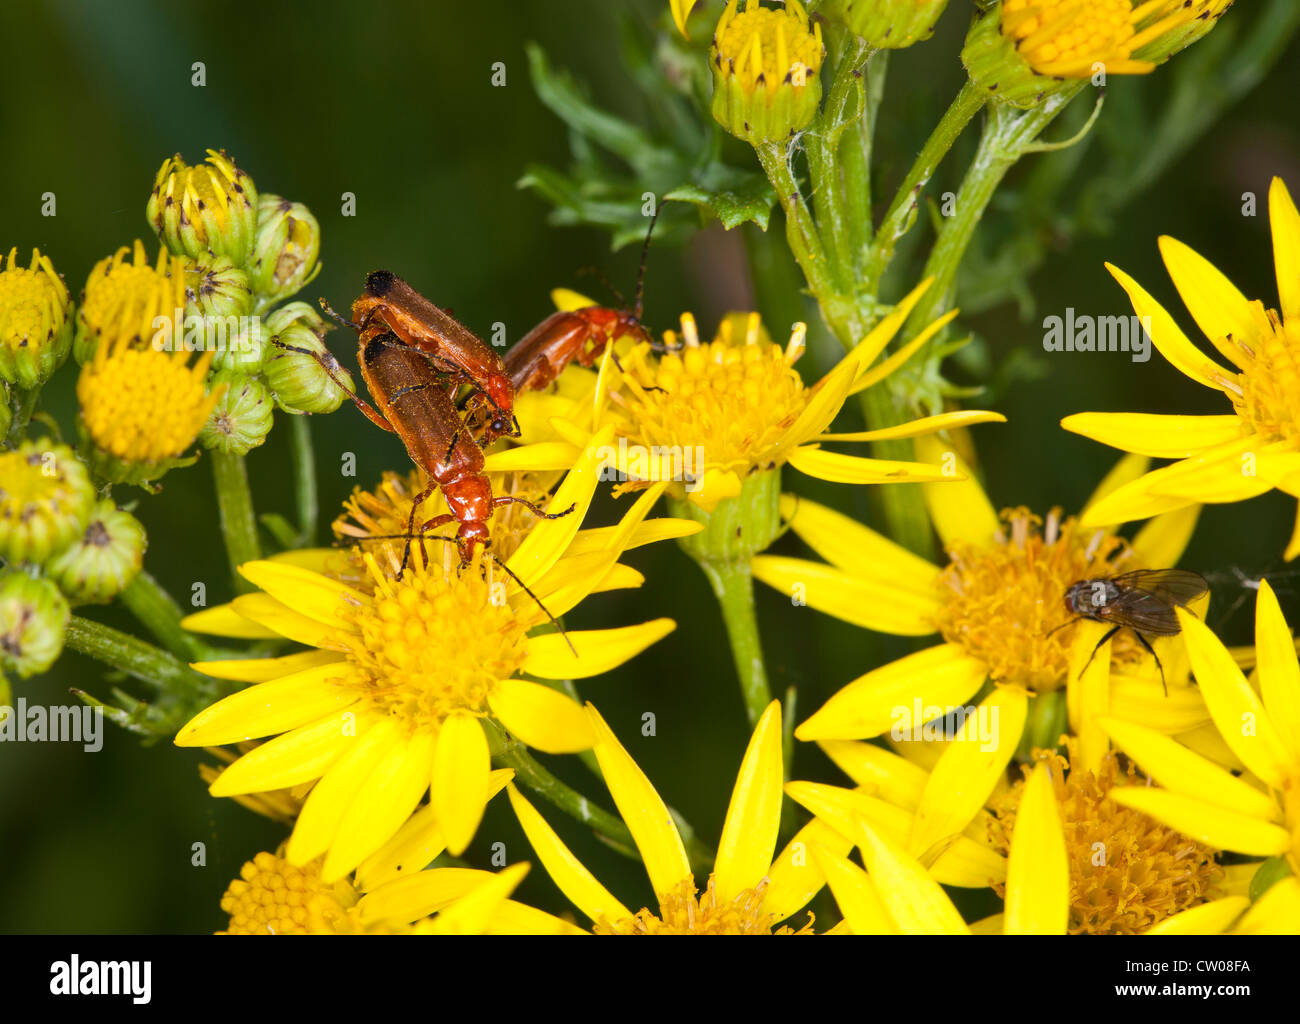 Common Soldier Beetle on Oxford Ragwort Stock Photo